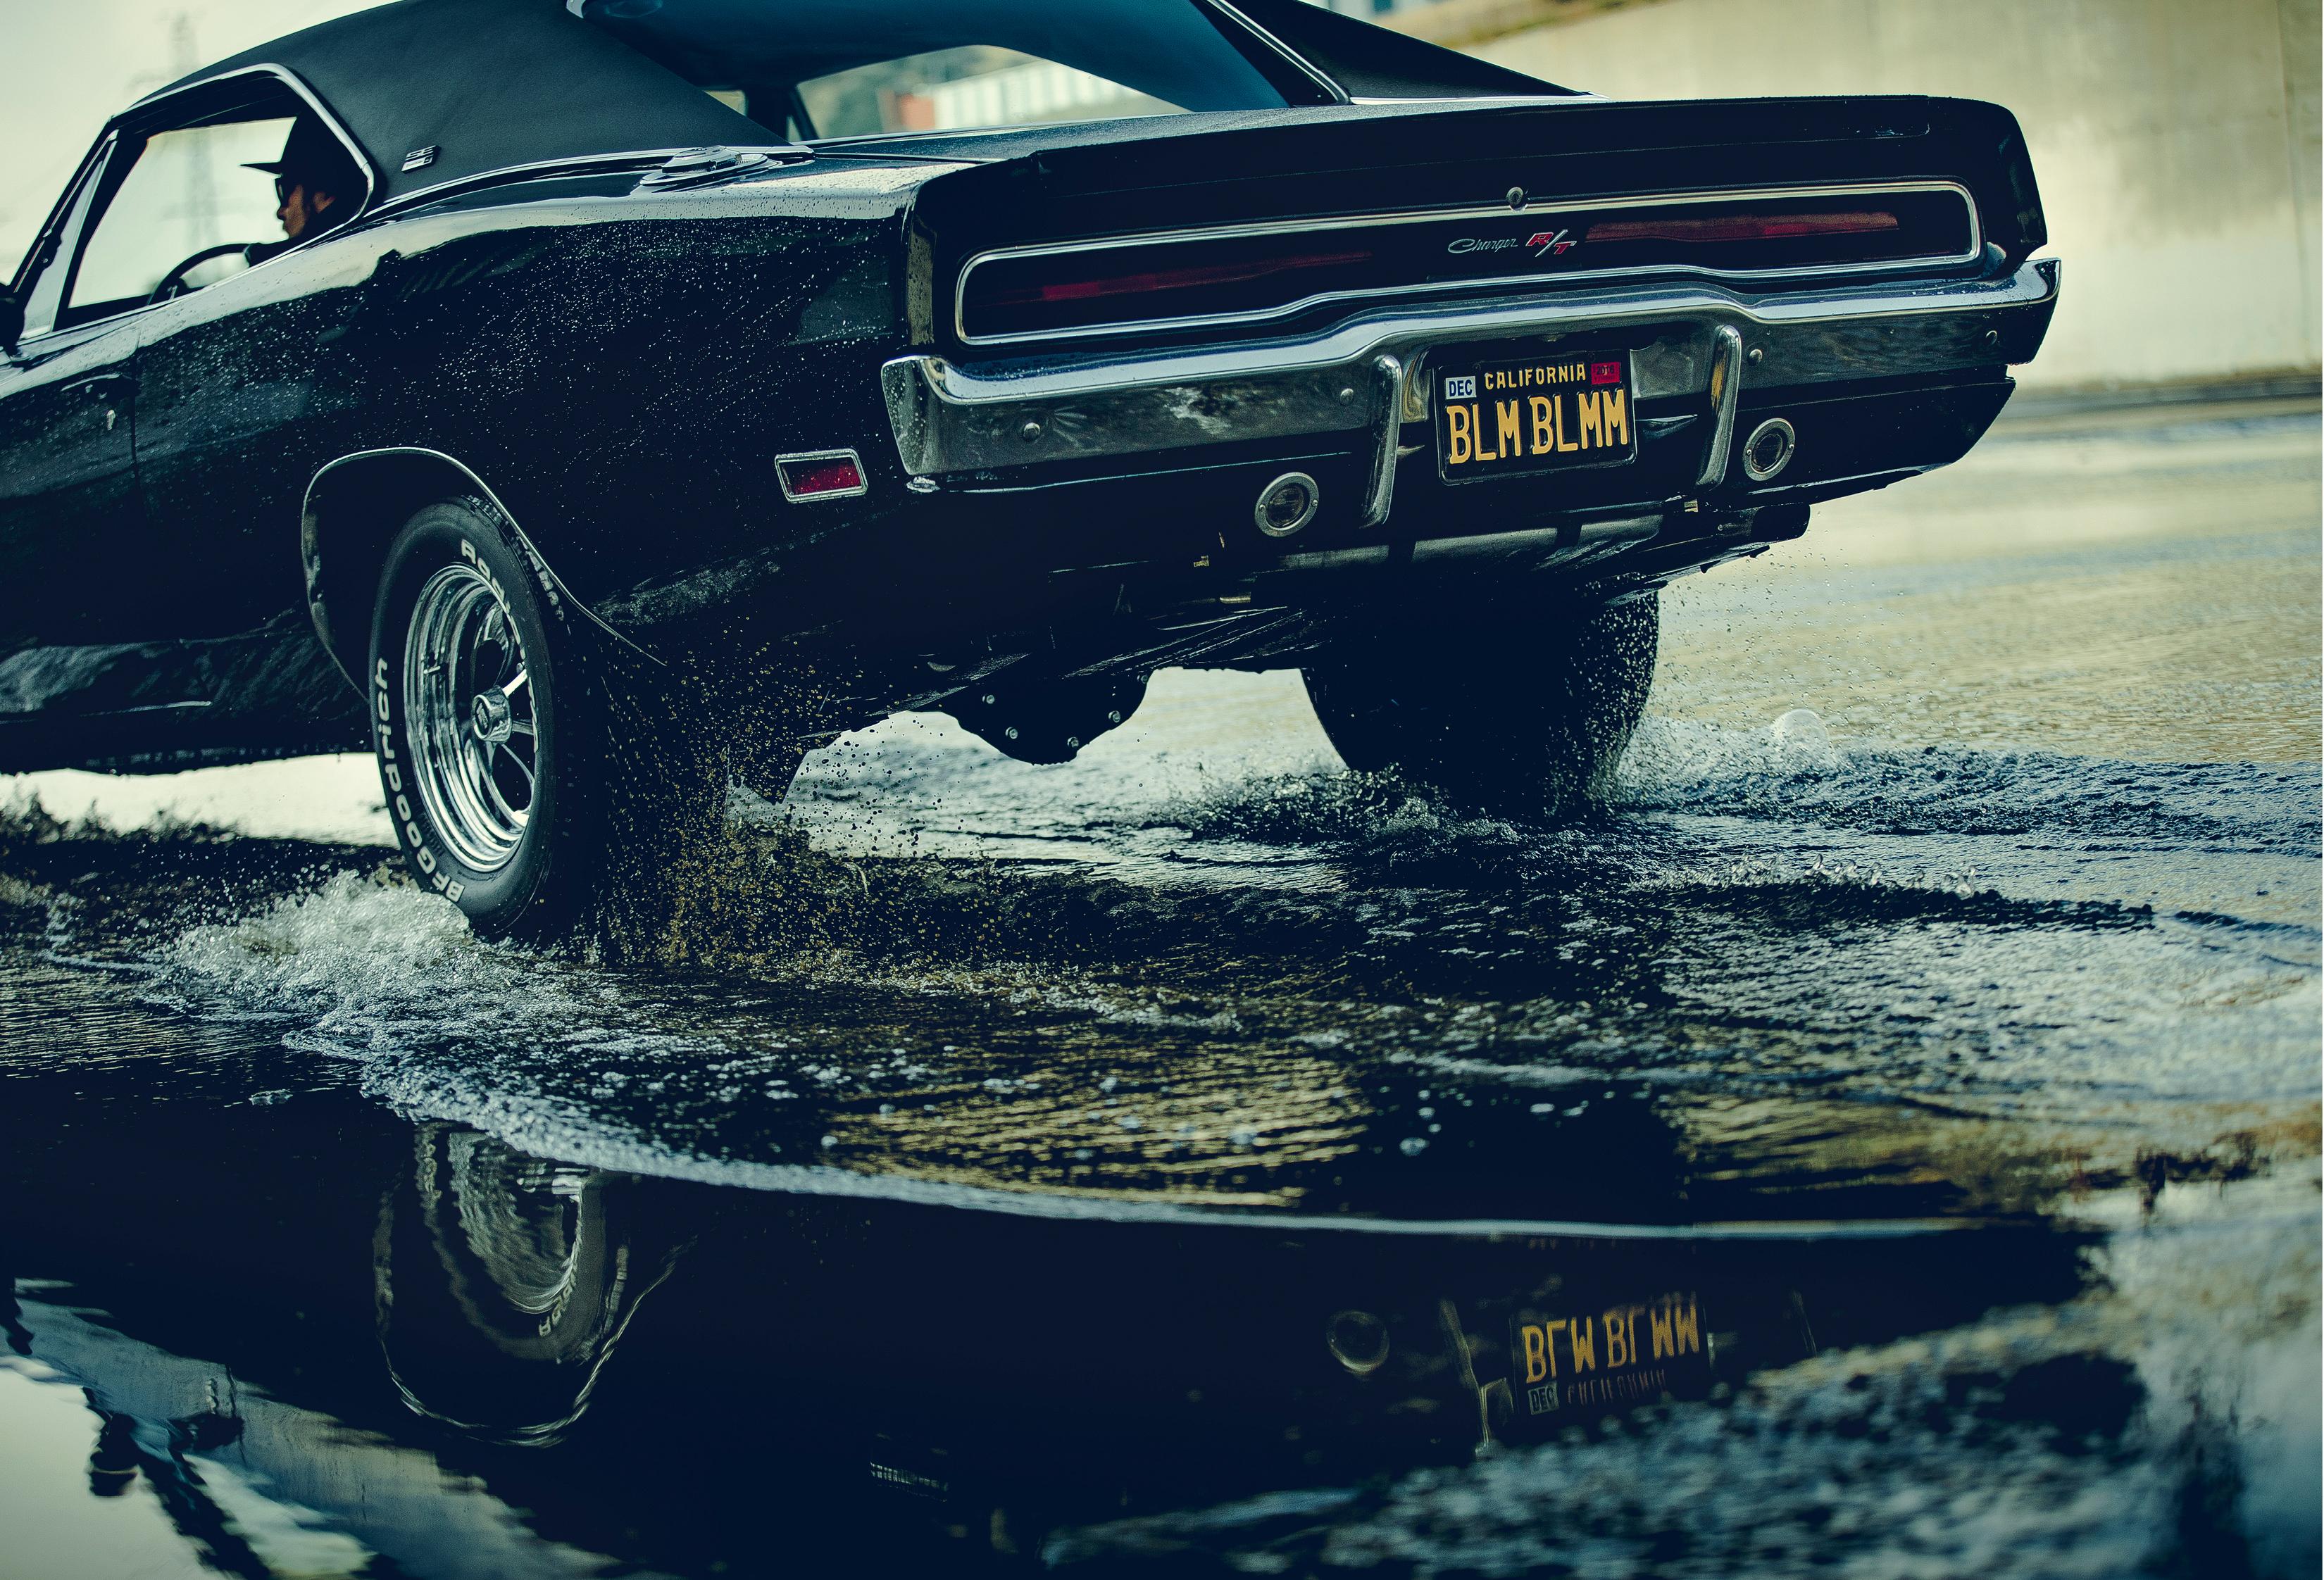 Black Car Reflection Water 3300x2244